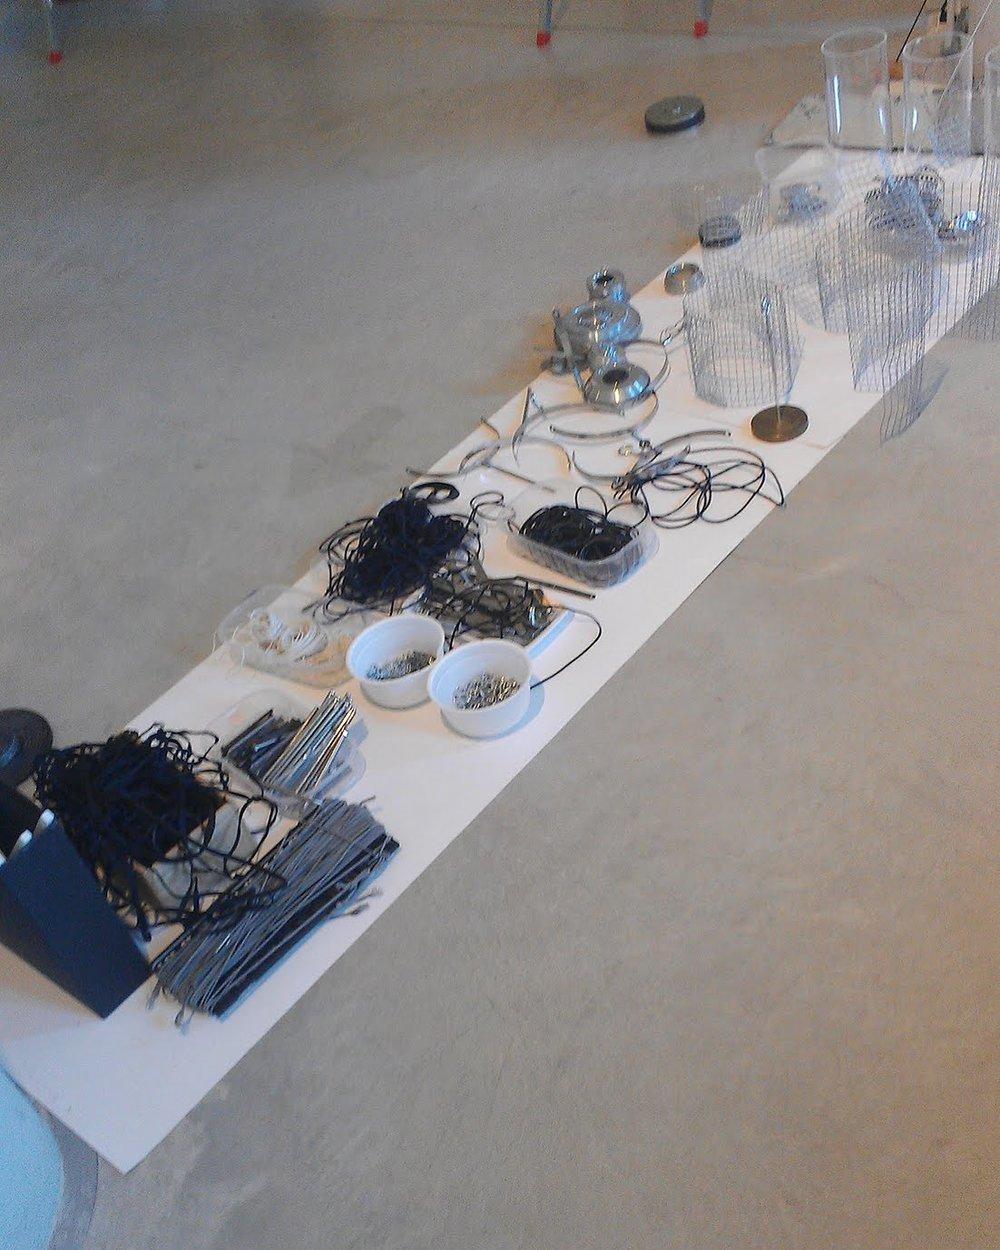 Materials for 'Aeroplastico' in Loris Malaguzzi International Centre